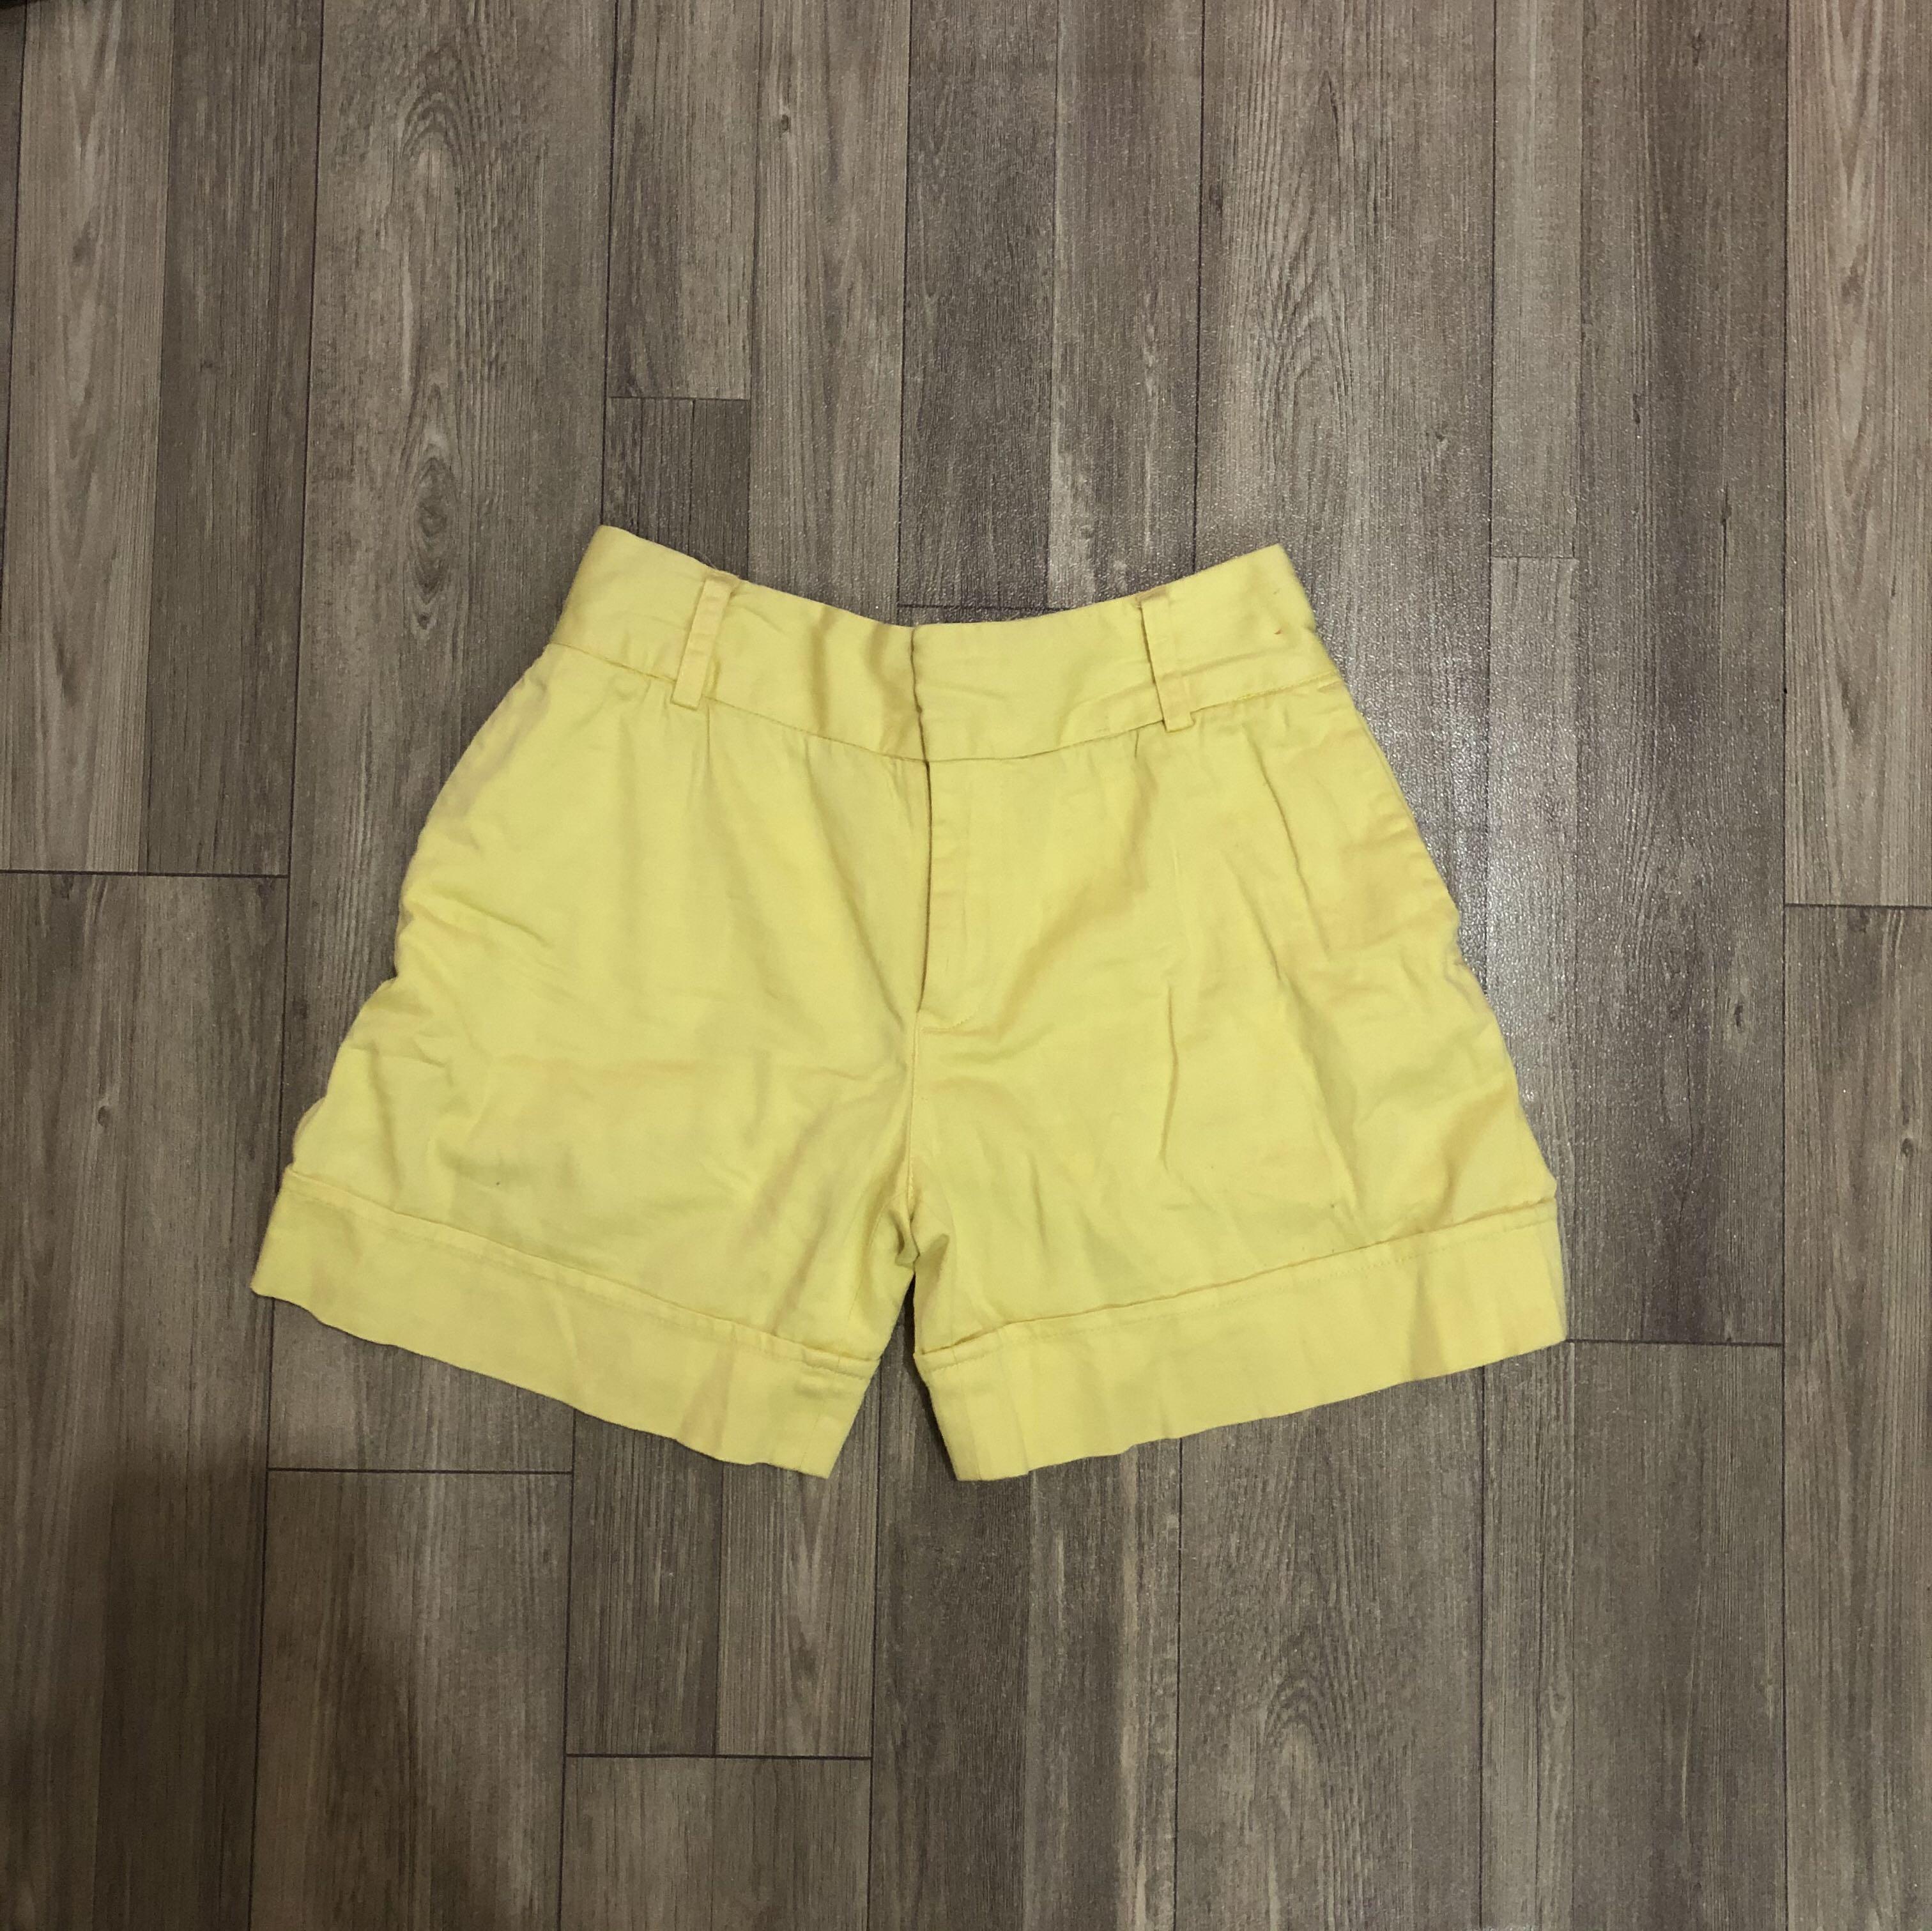 Yellow hot pants